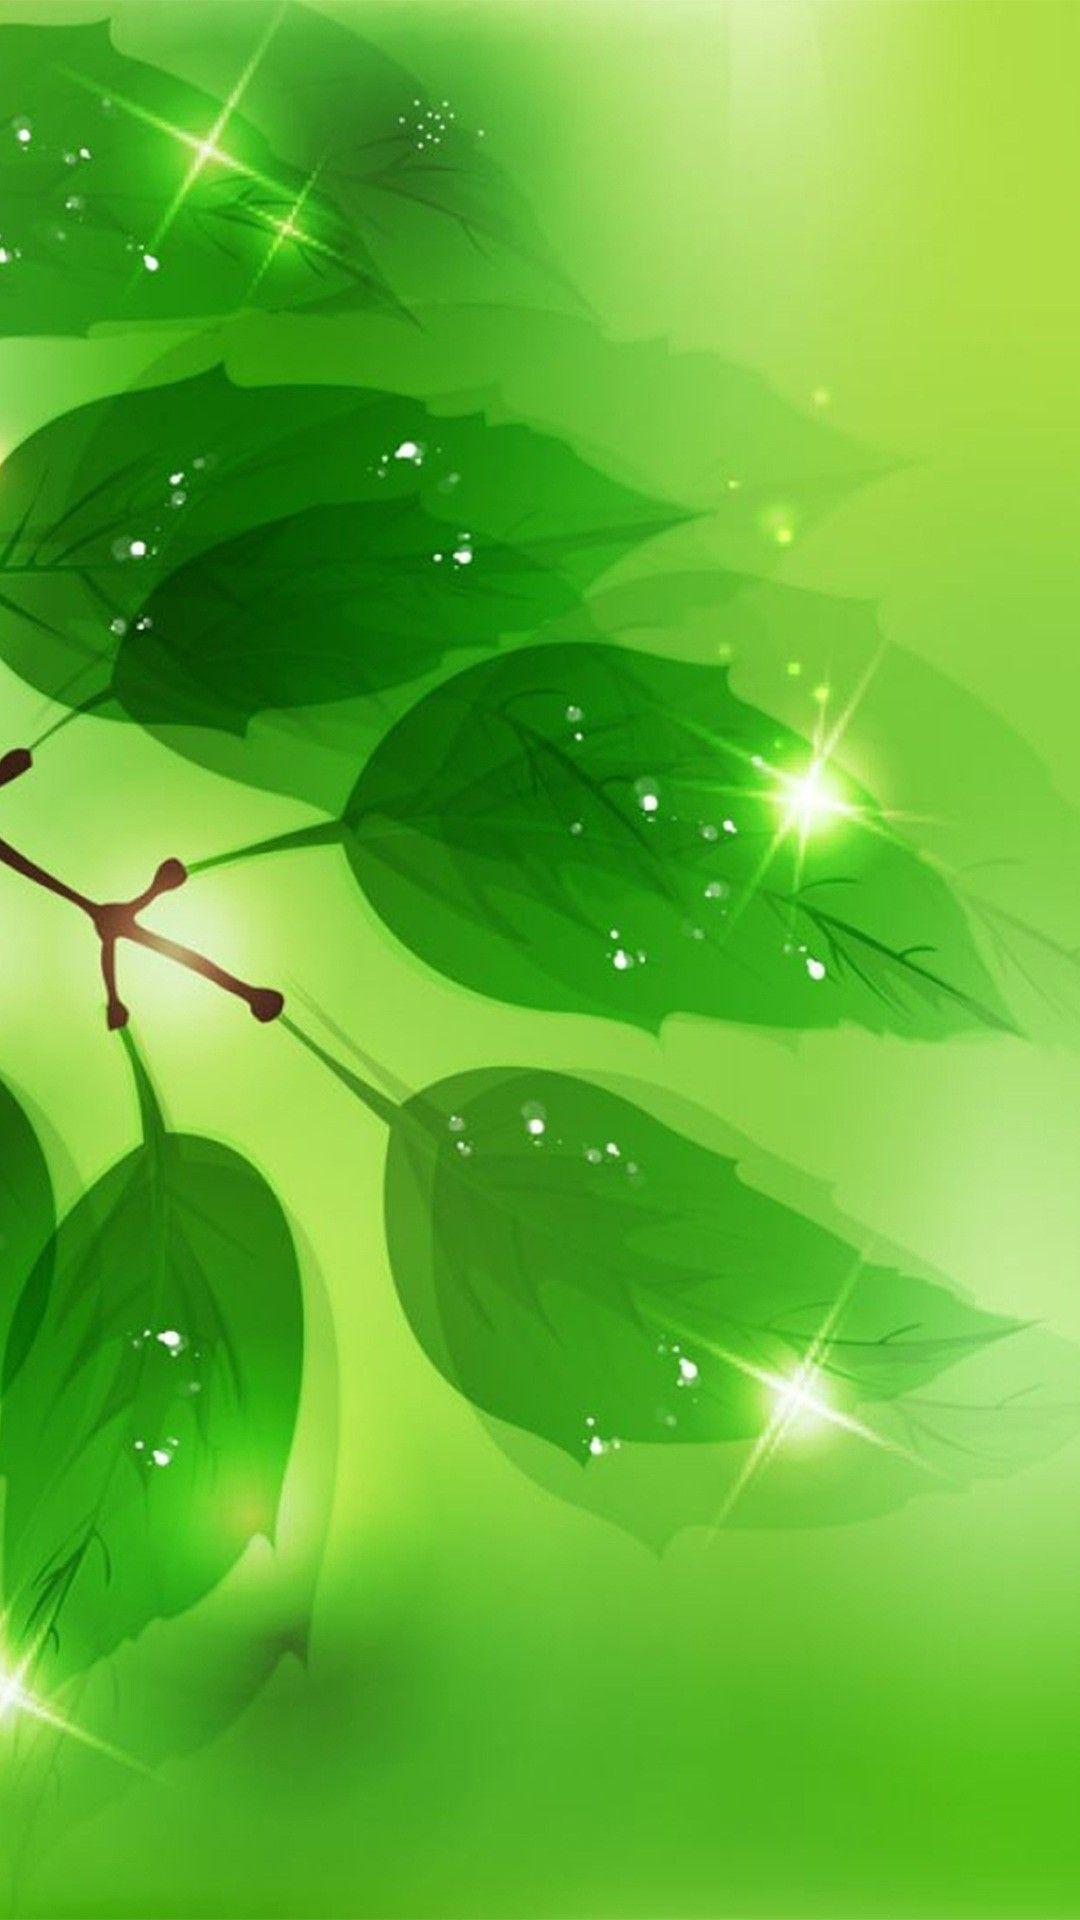 Background Hijau Islami : background, hijau, islami, Hijau, Wallpapers, Backgrounds, WallpaperAccess